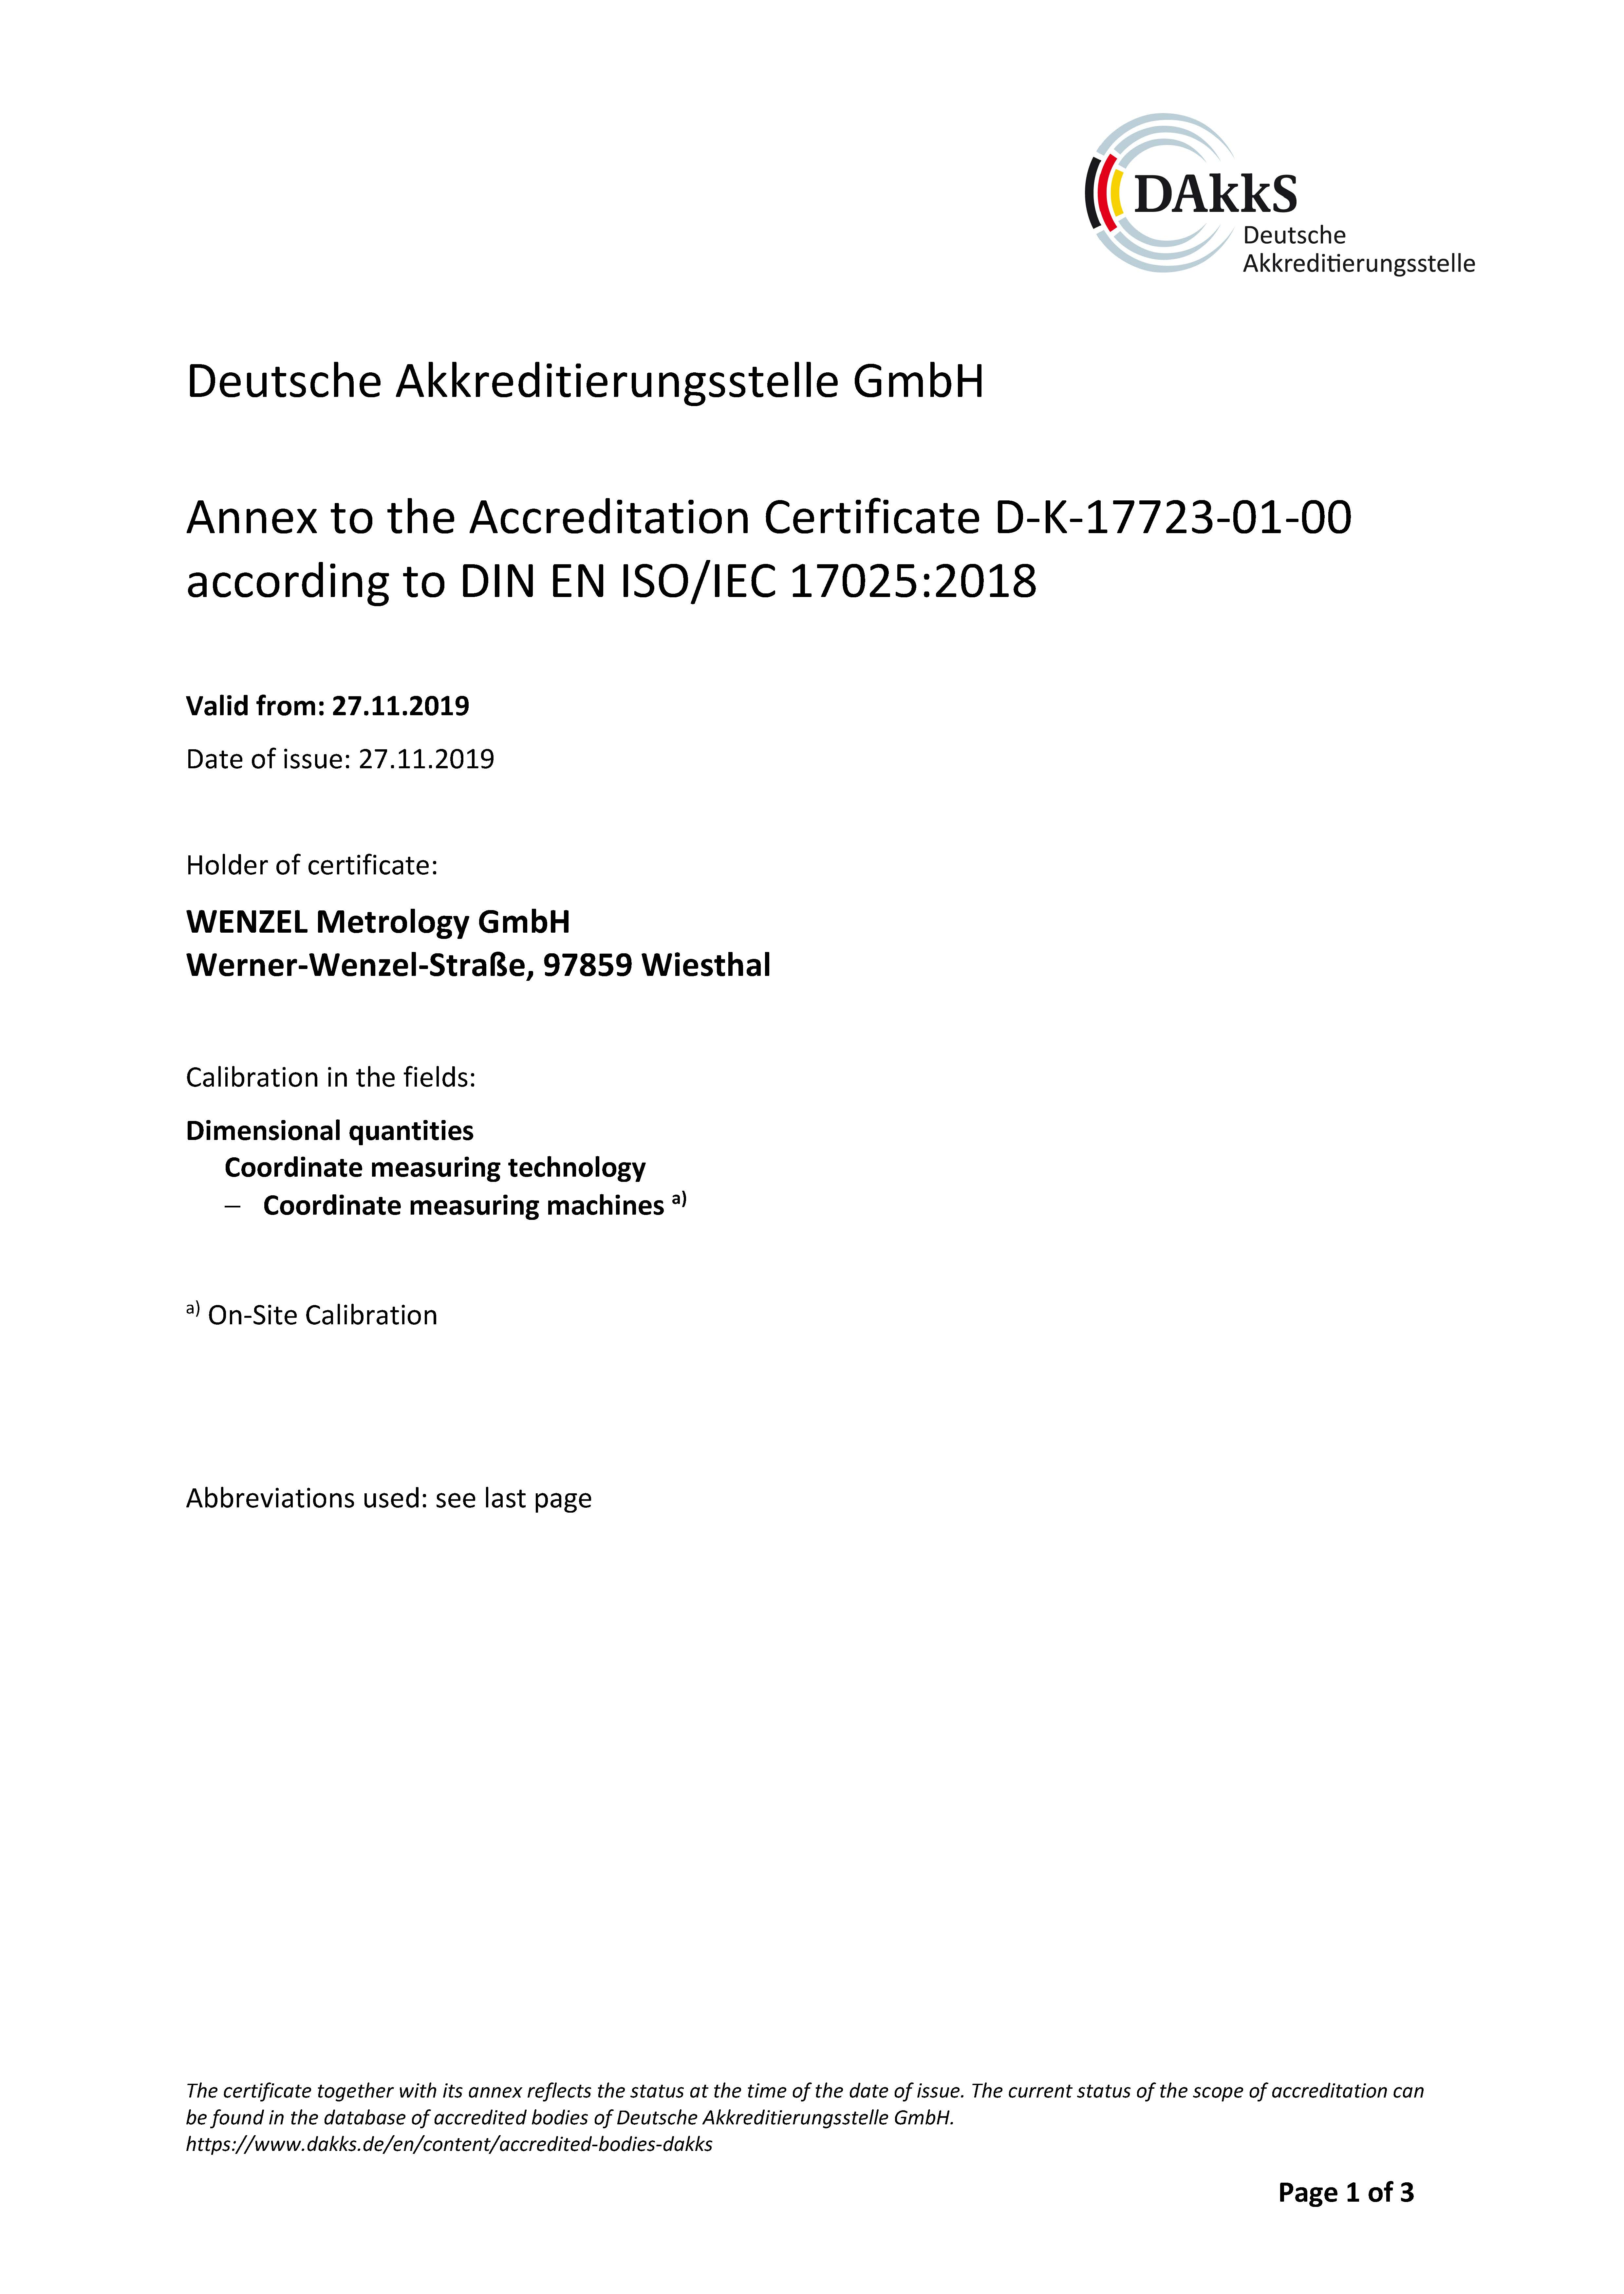 Annex Accreditation Certificate_D-K-17723-01-00_27.11.2019_Stránka_1